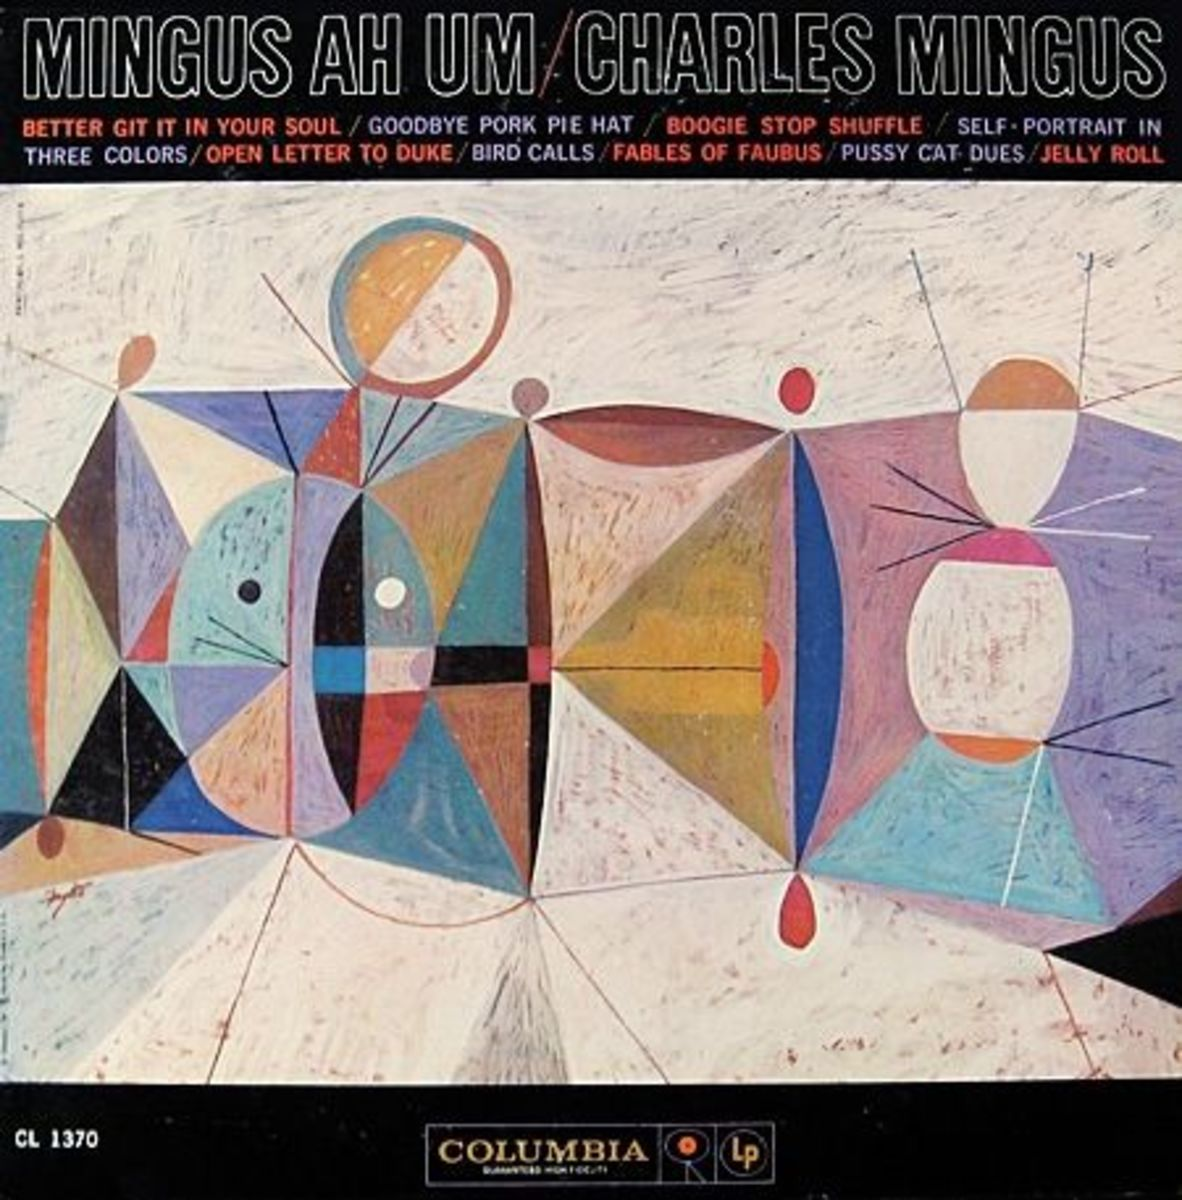 "Charles Mingus ""Ah Um"" Columbia Records CL 1370 12"" LP Vinyl Reocrd (1959) Album Cover Painting by Neil Fujita"